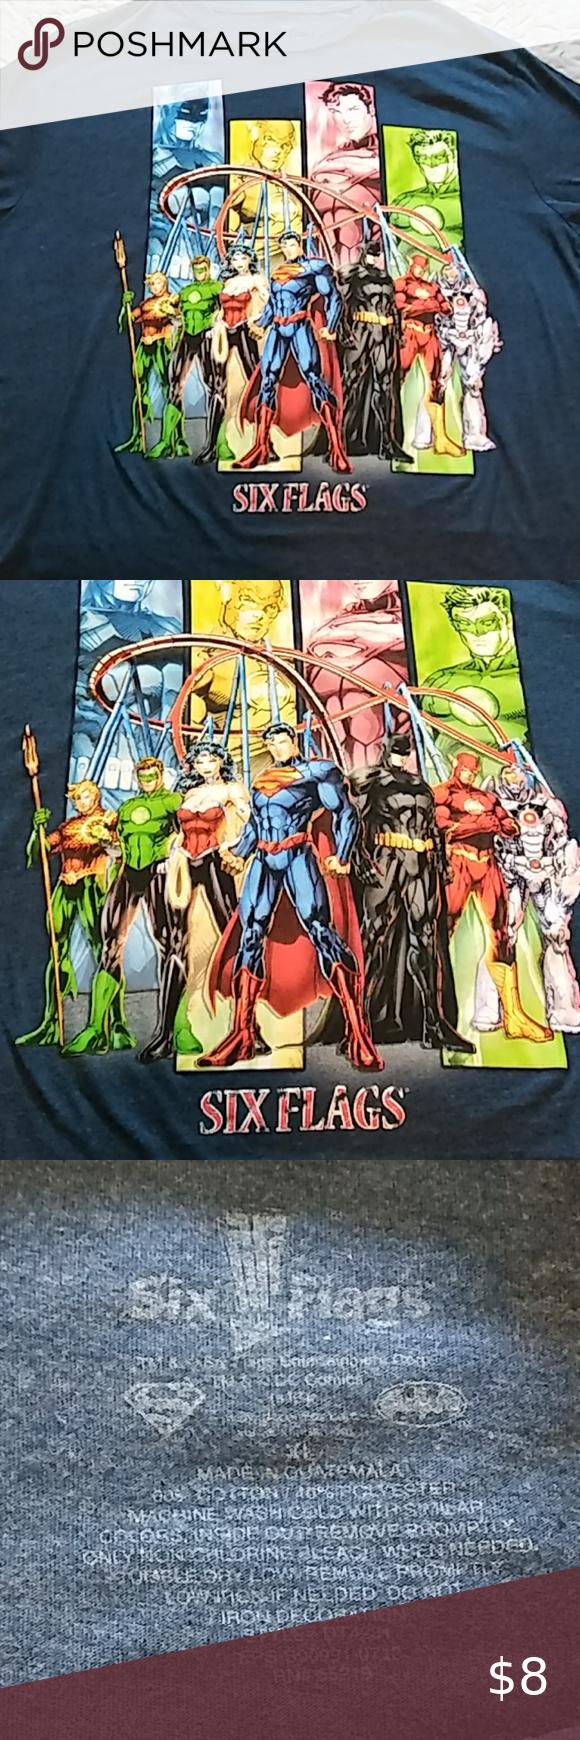 Six Flags Dc Comics Shirt Length 29 5 Width 23 Six Flags Shirts Tops Tees Short Sleeve In 2020 Dc Comics Shirts Dc Comics Dc Characters